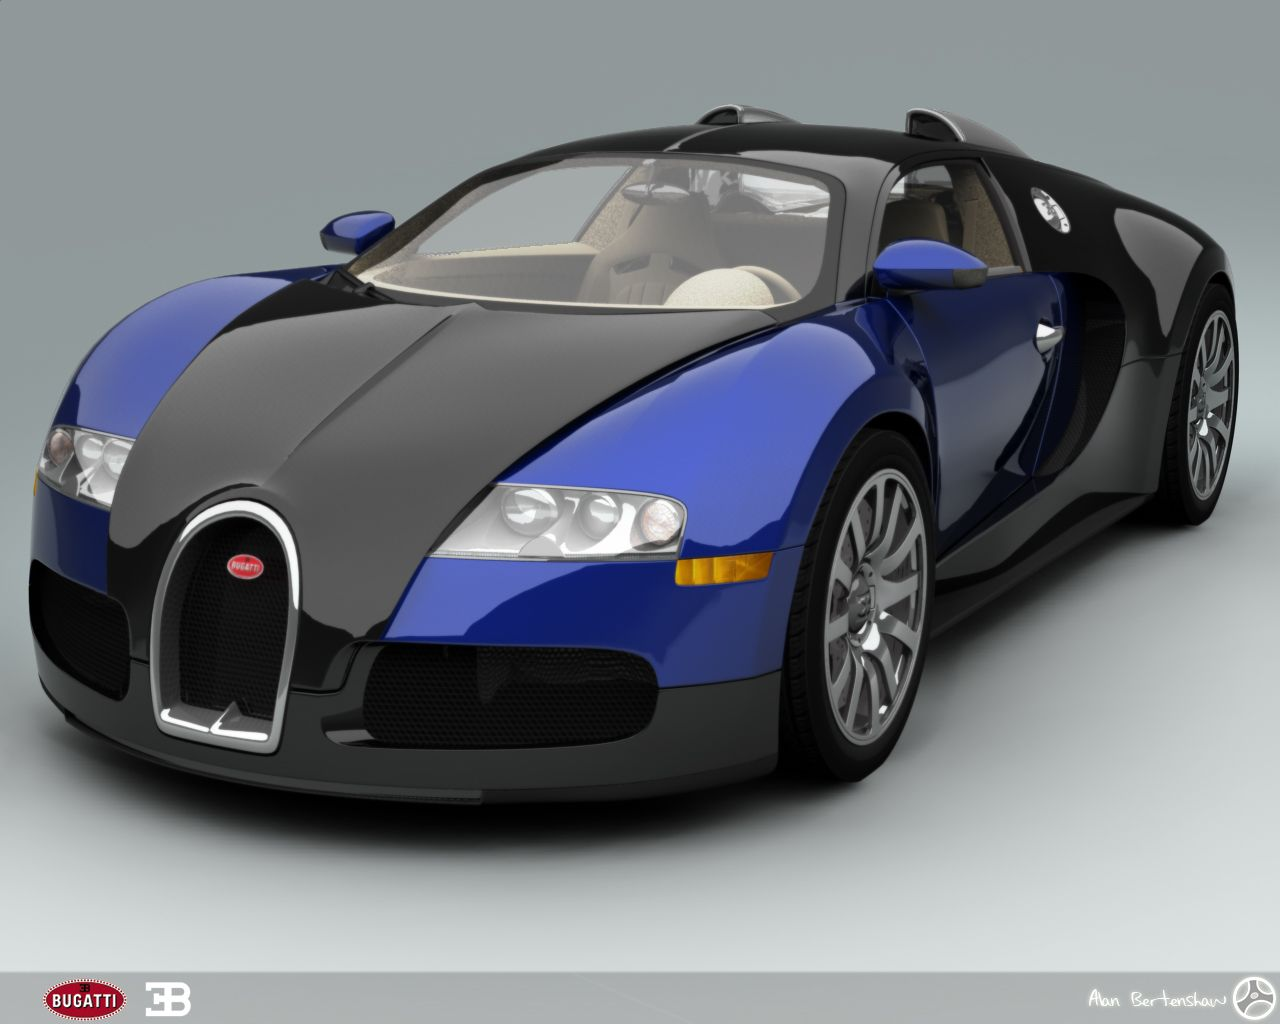 Cars Wallpapers12 Bugatti Veyron Wallpaper Bugatti Veyron Bugatti Super Sport